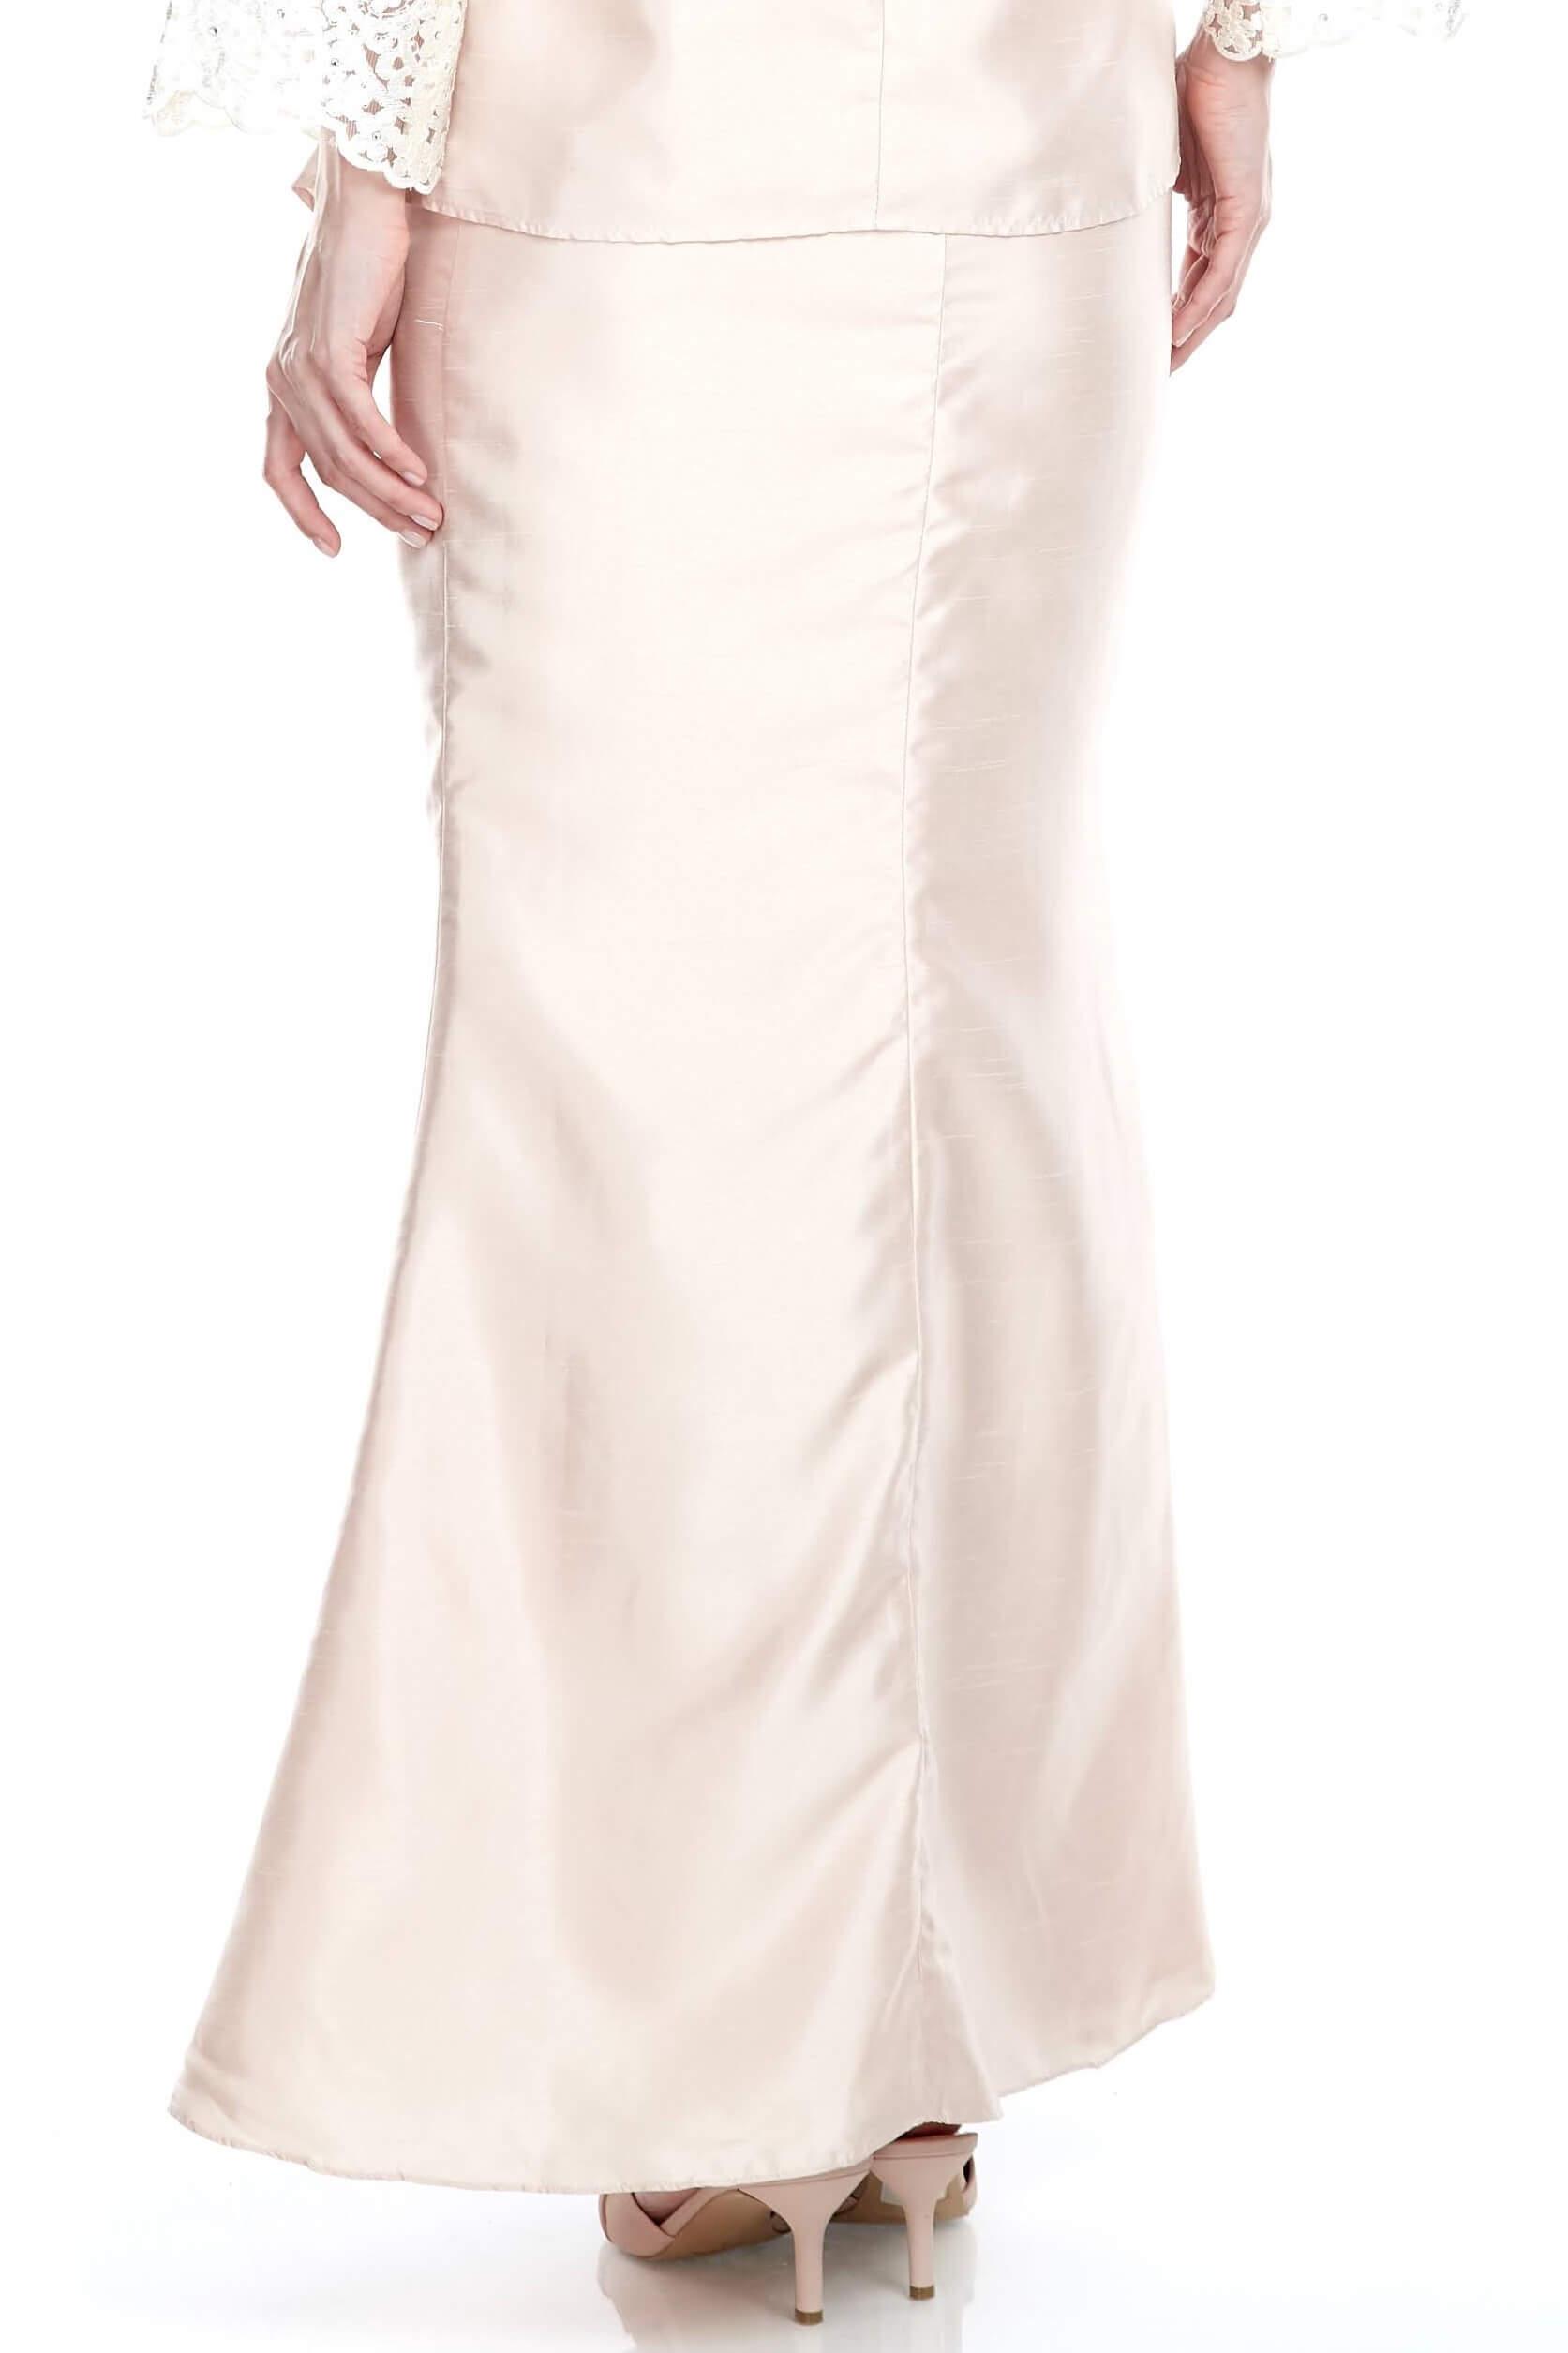 Peach Mermaid Skirt (5)